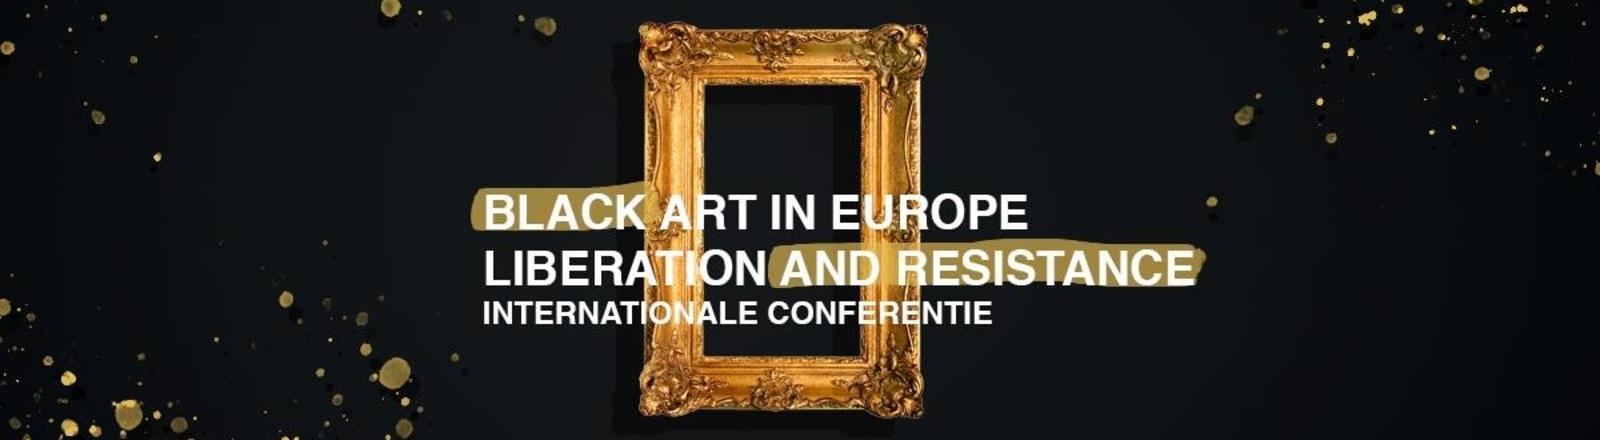 CONFERENTIE : BLACK ART IN EUROPE